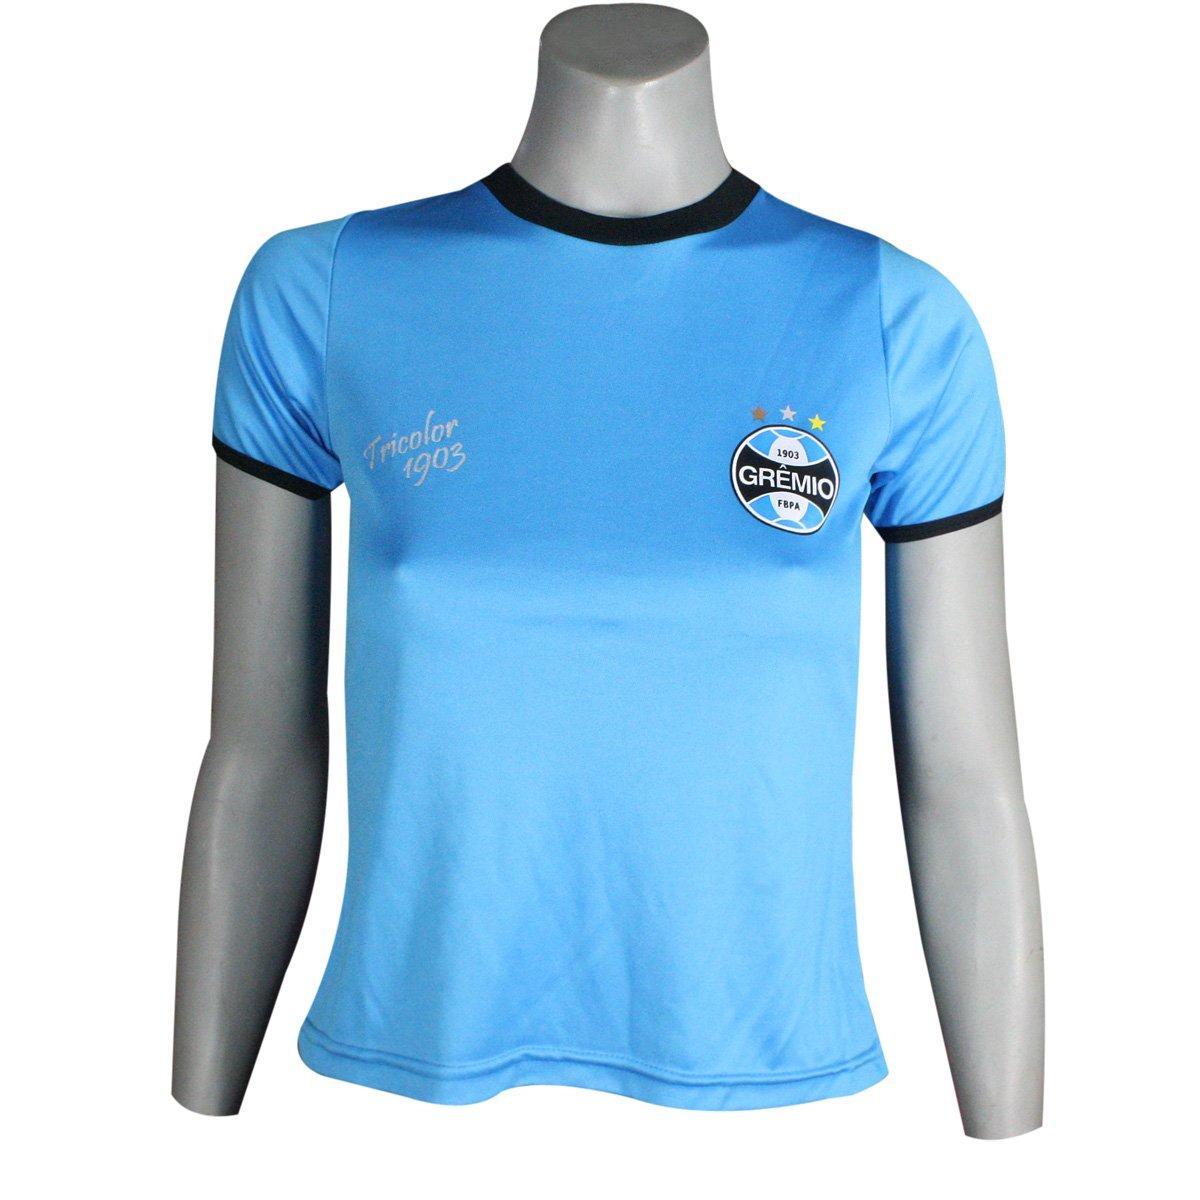 Camiseta Feminina Dilva Oldoni Grêmio a756e54658d18